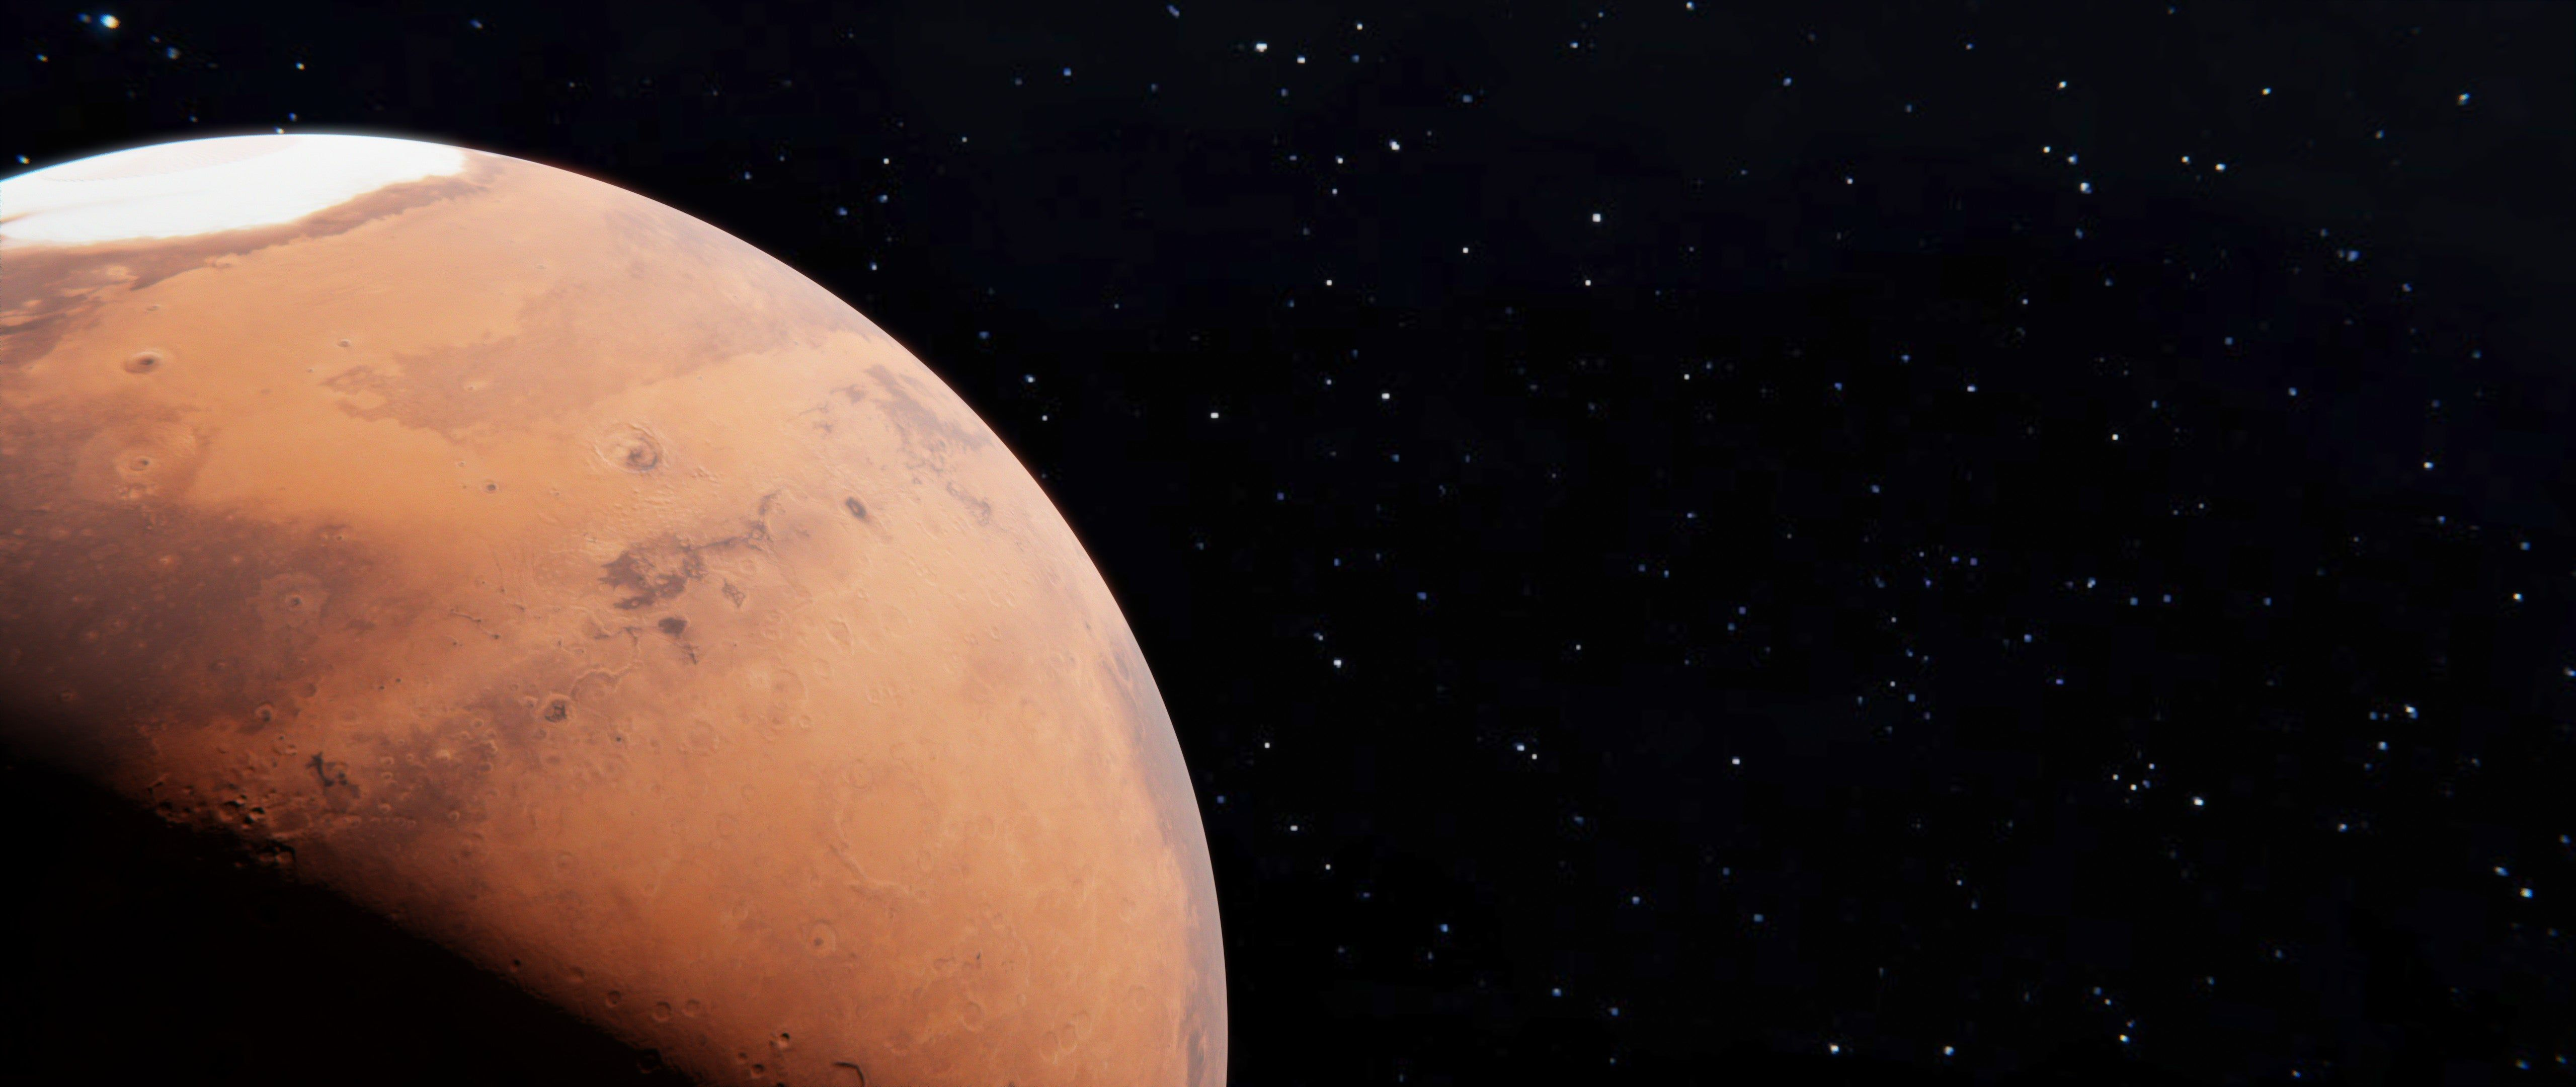 Mars 4k Wallpaper Mars Wallpaper Wallpaper Nasa Mars